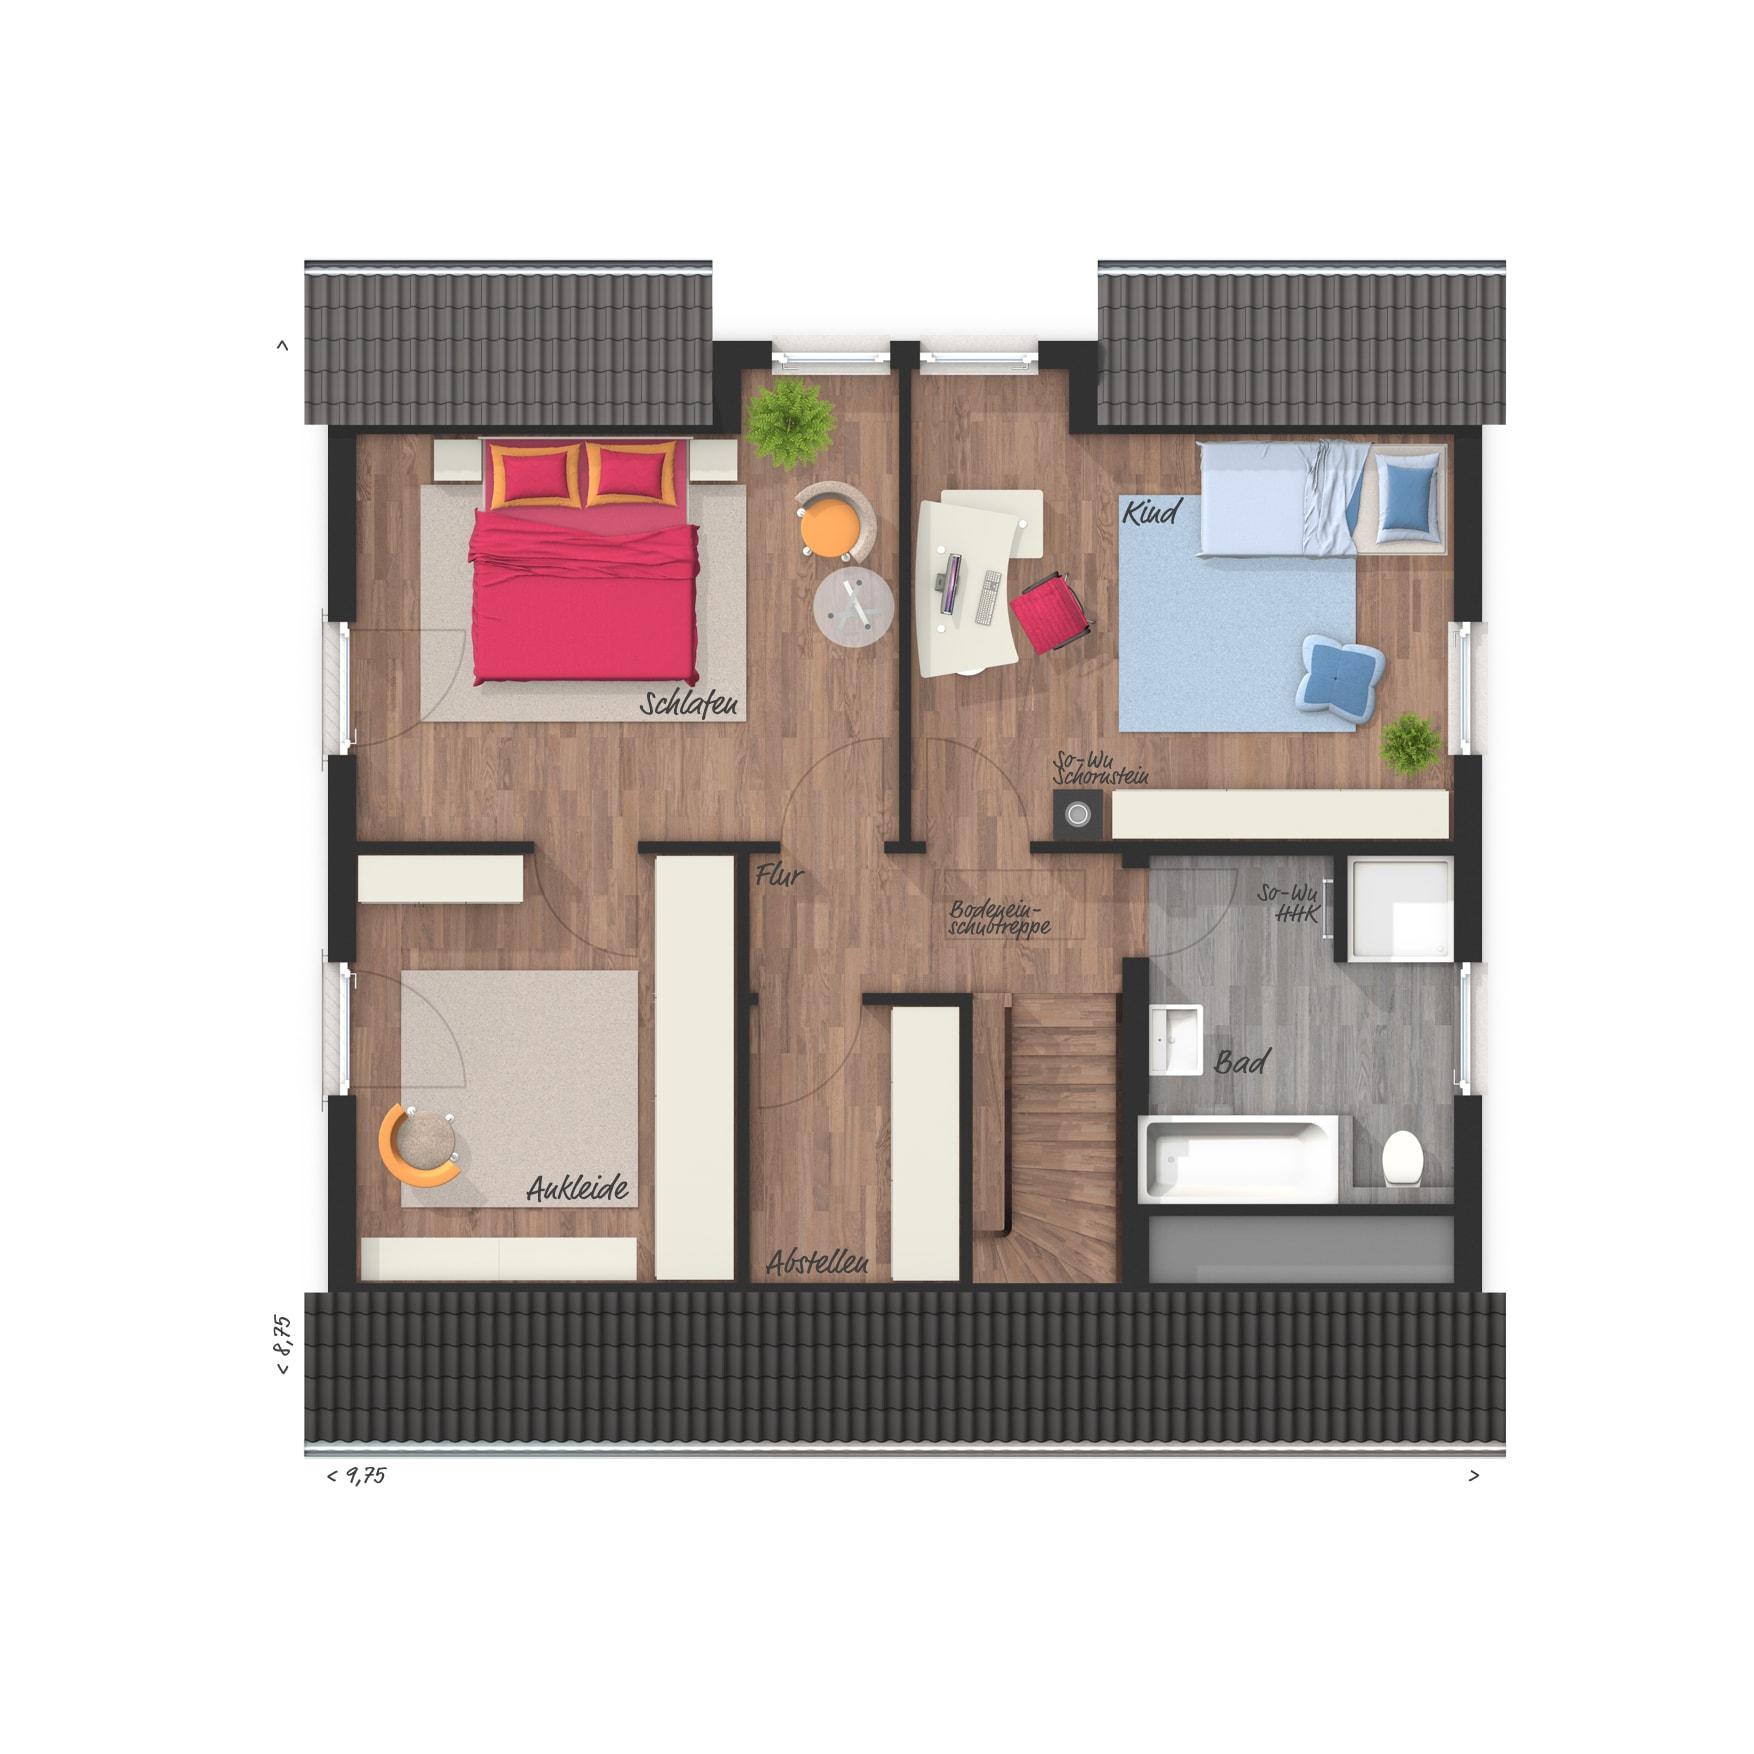 Grundriss Einfamilienhaus Dachgeschoss, Schlafzimmer mit Ankleide - Town Country Haus Flair 125 - HausbauDirekt.de